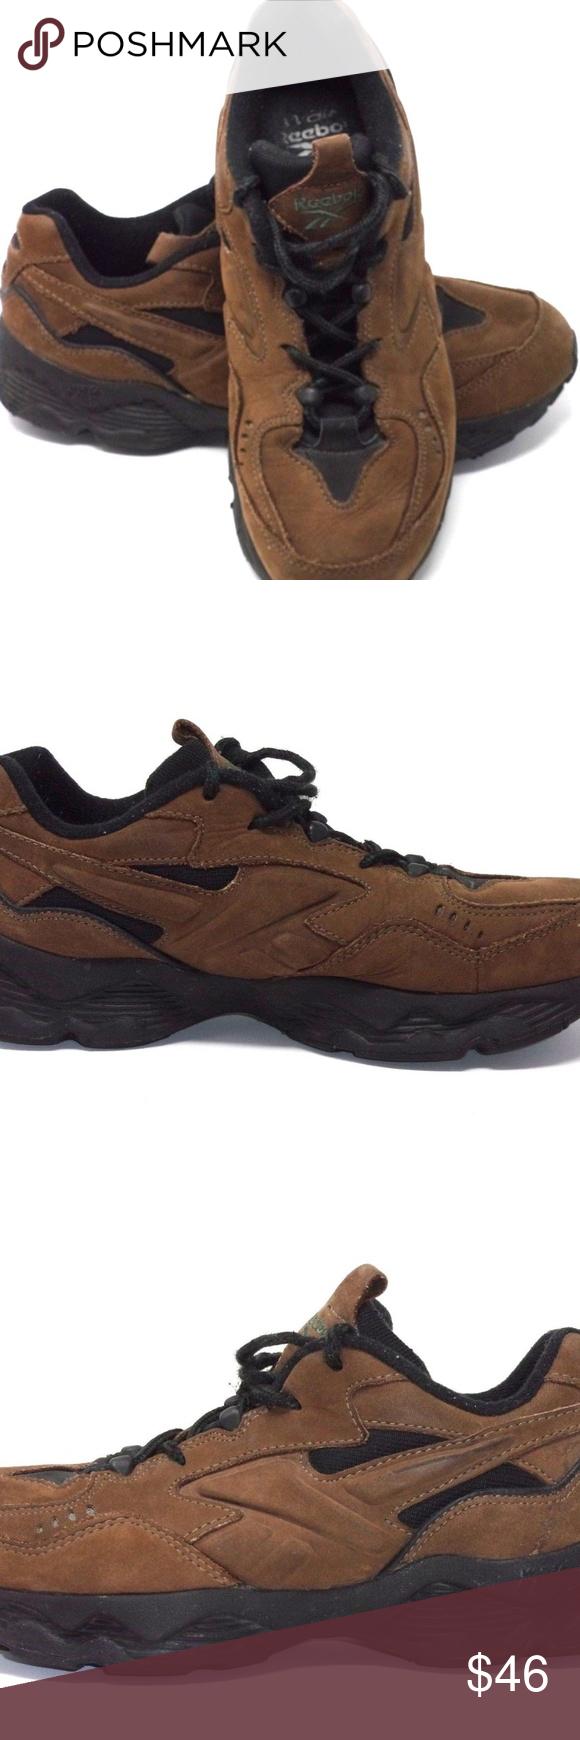 4335449440 Reebok Men's DMX Walking Shoe Brown Reebok Men's DMX Walking Shoe ...